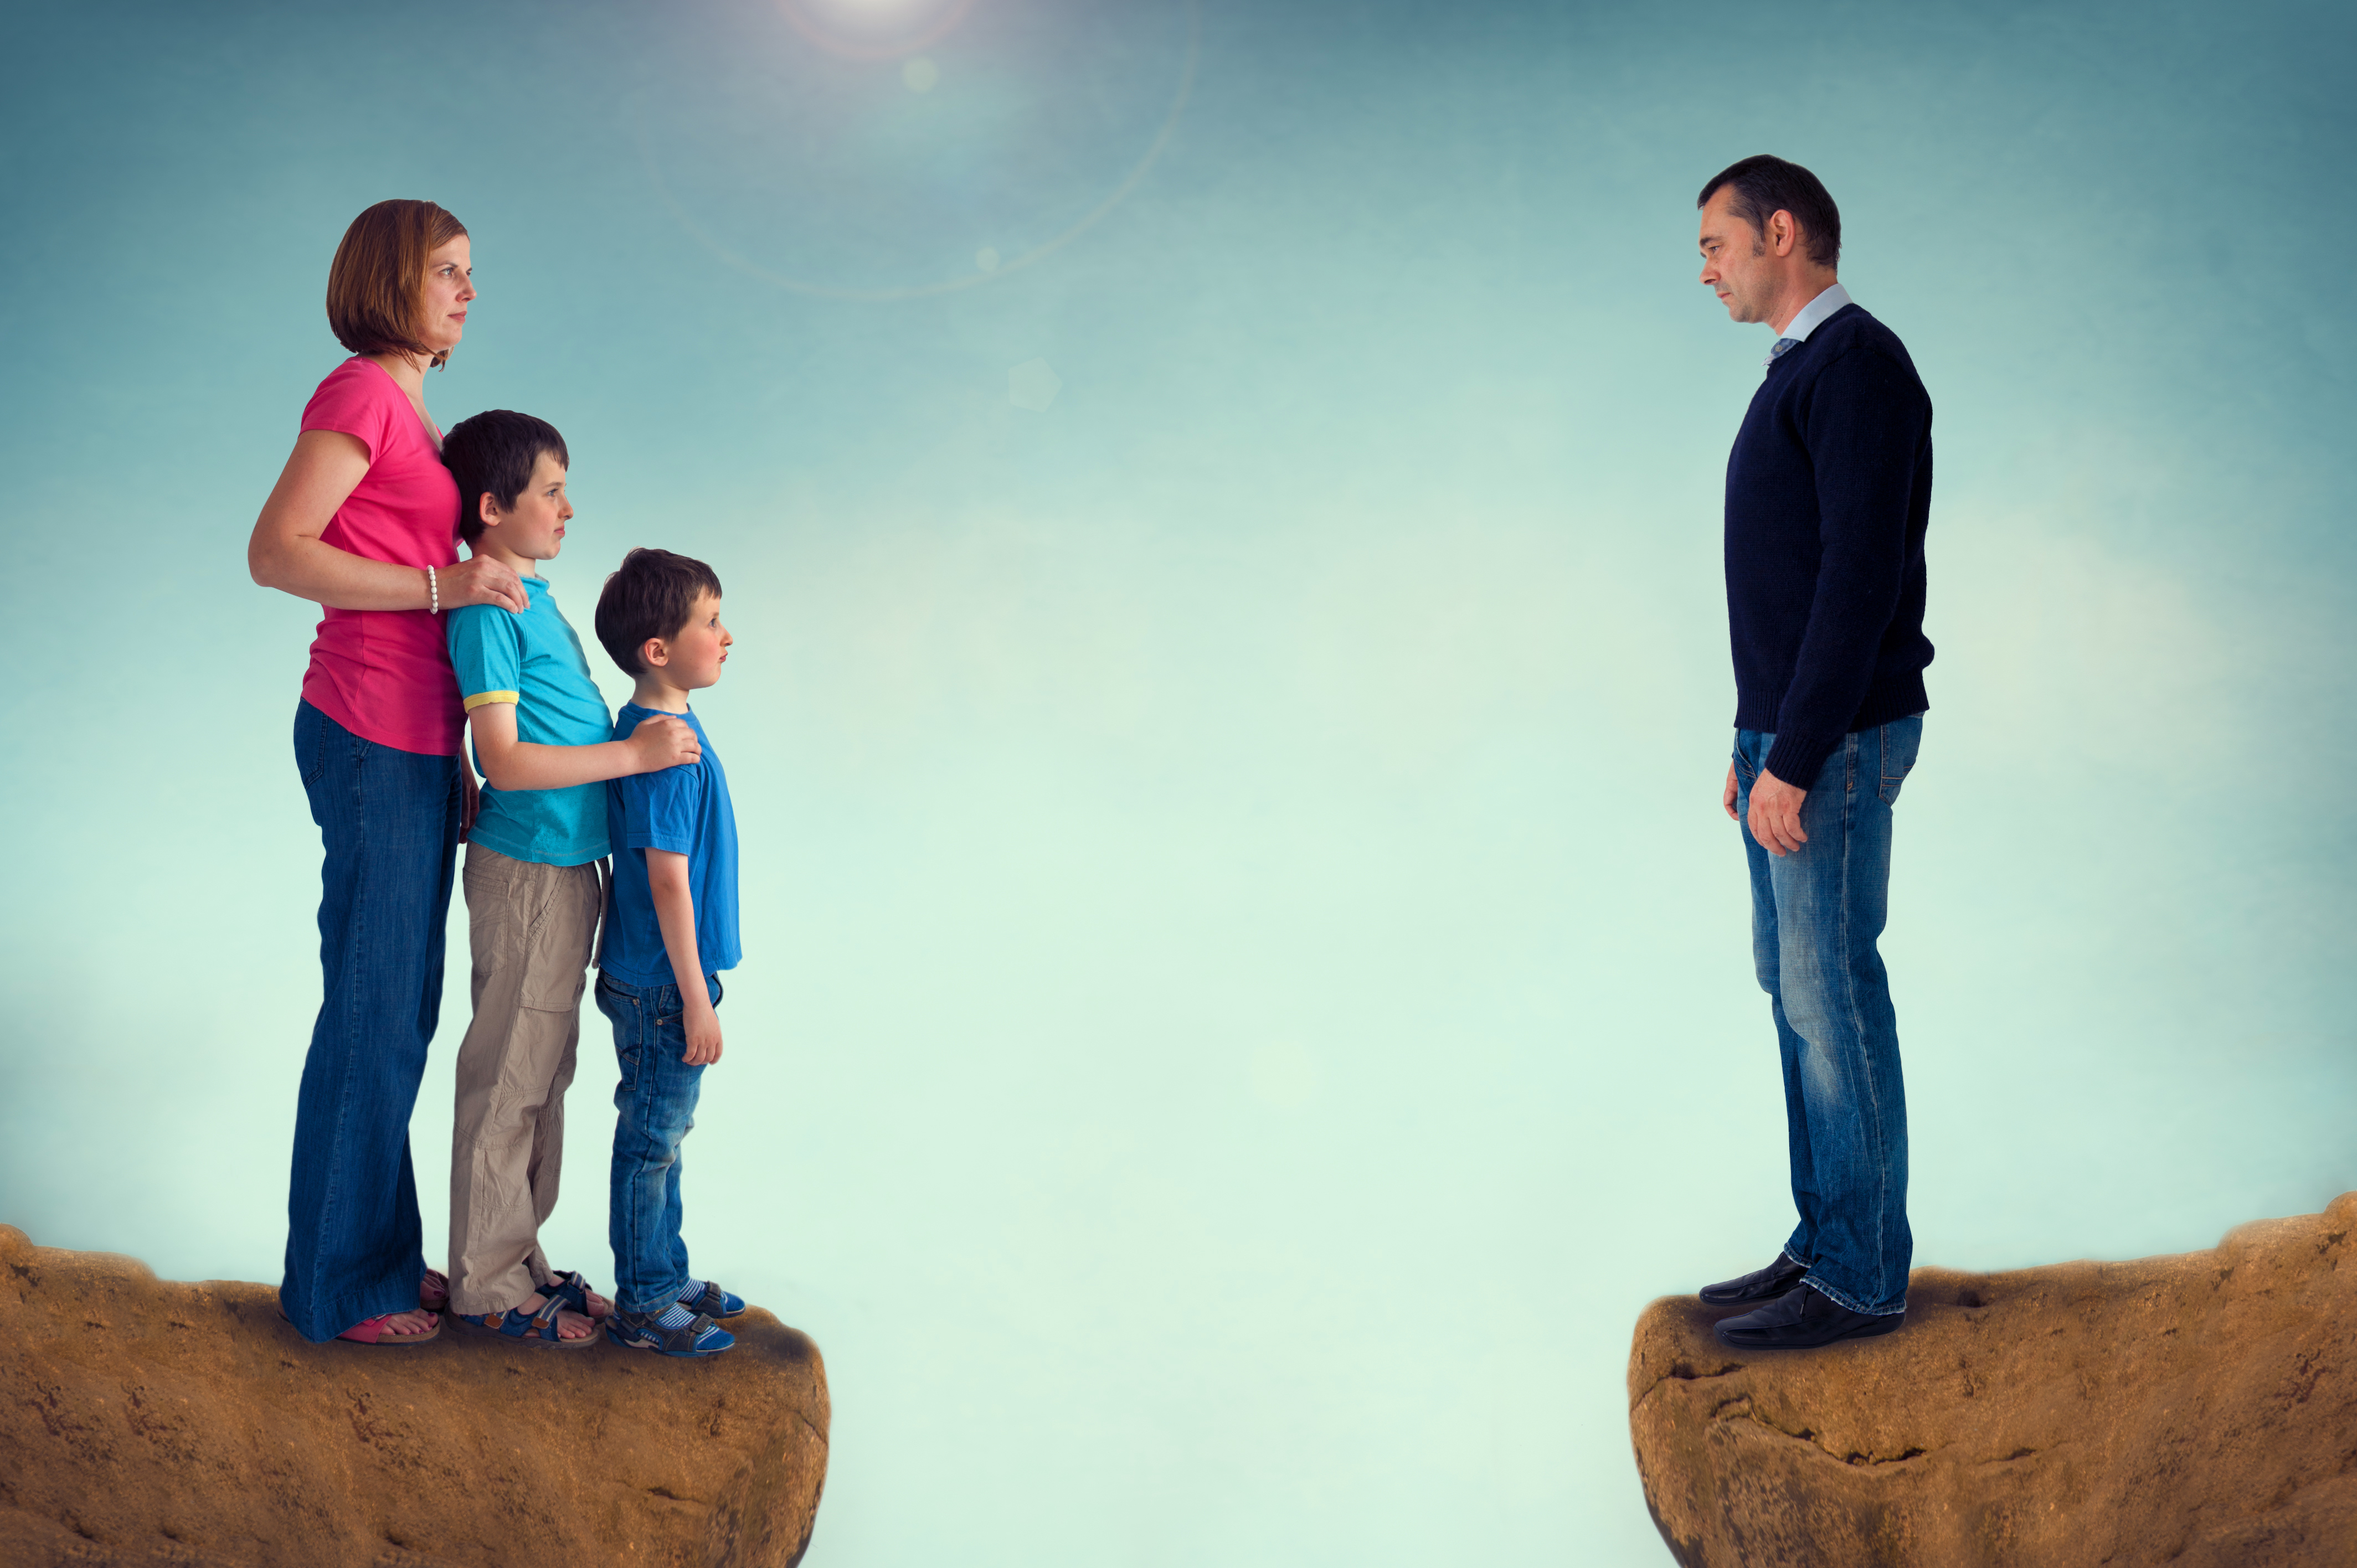 Šest znakova da je razvod blizu